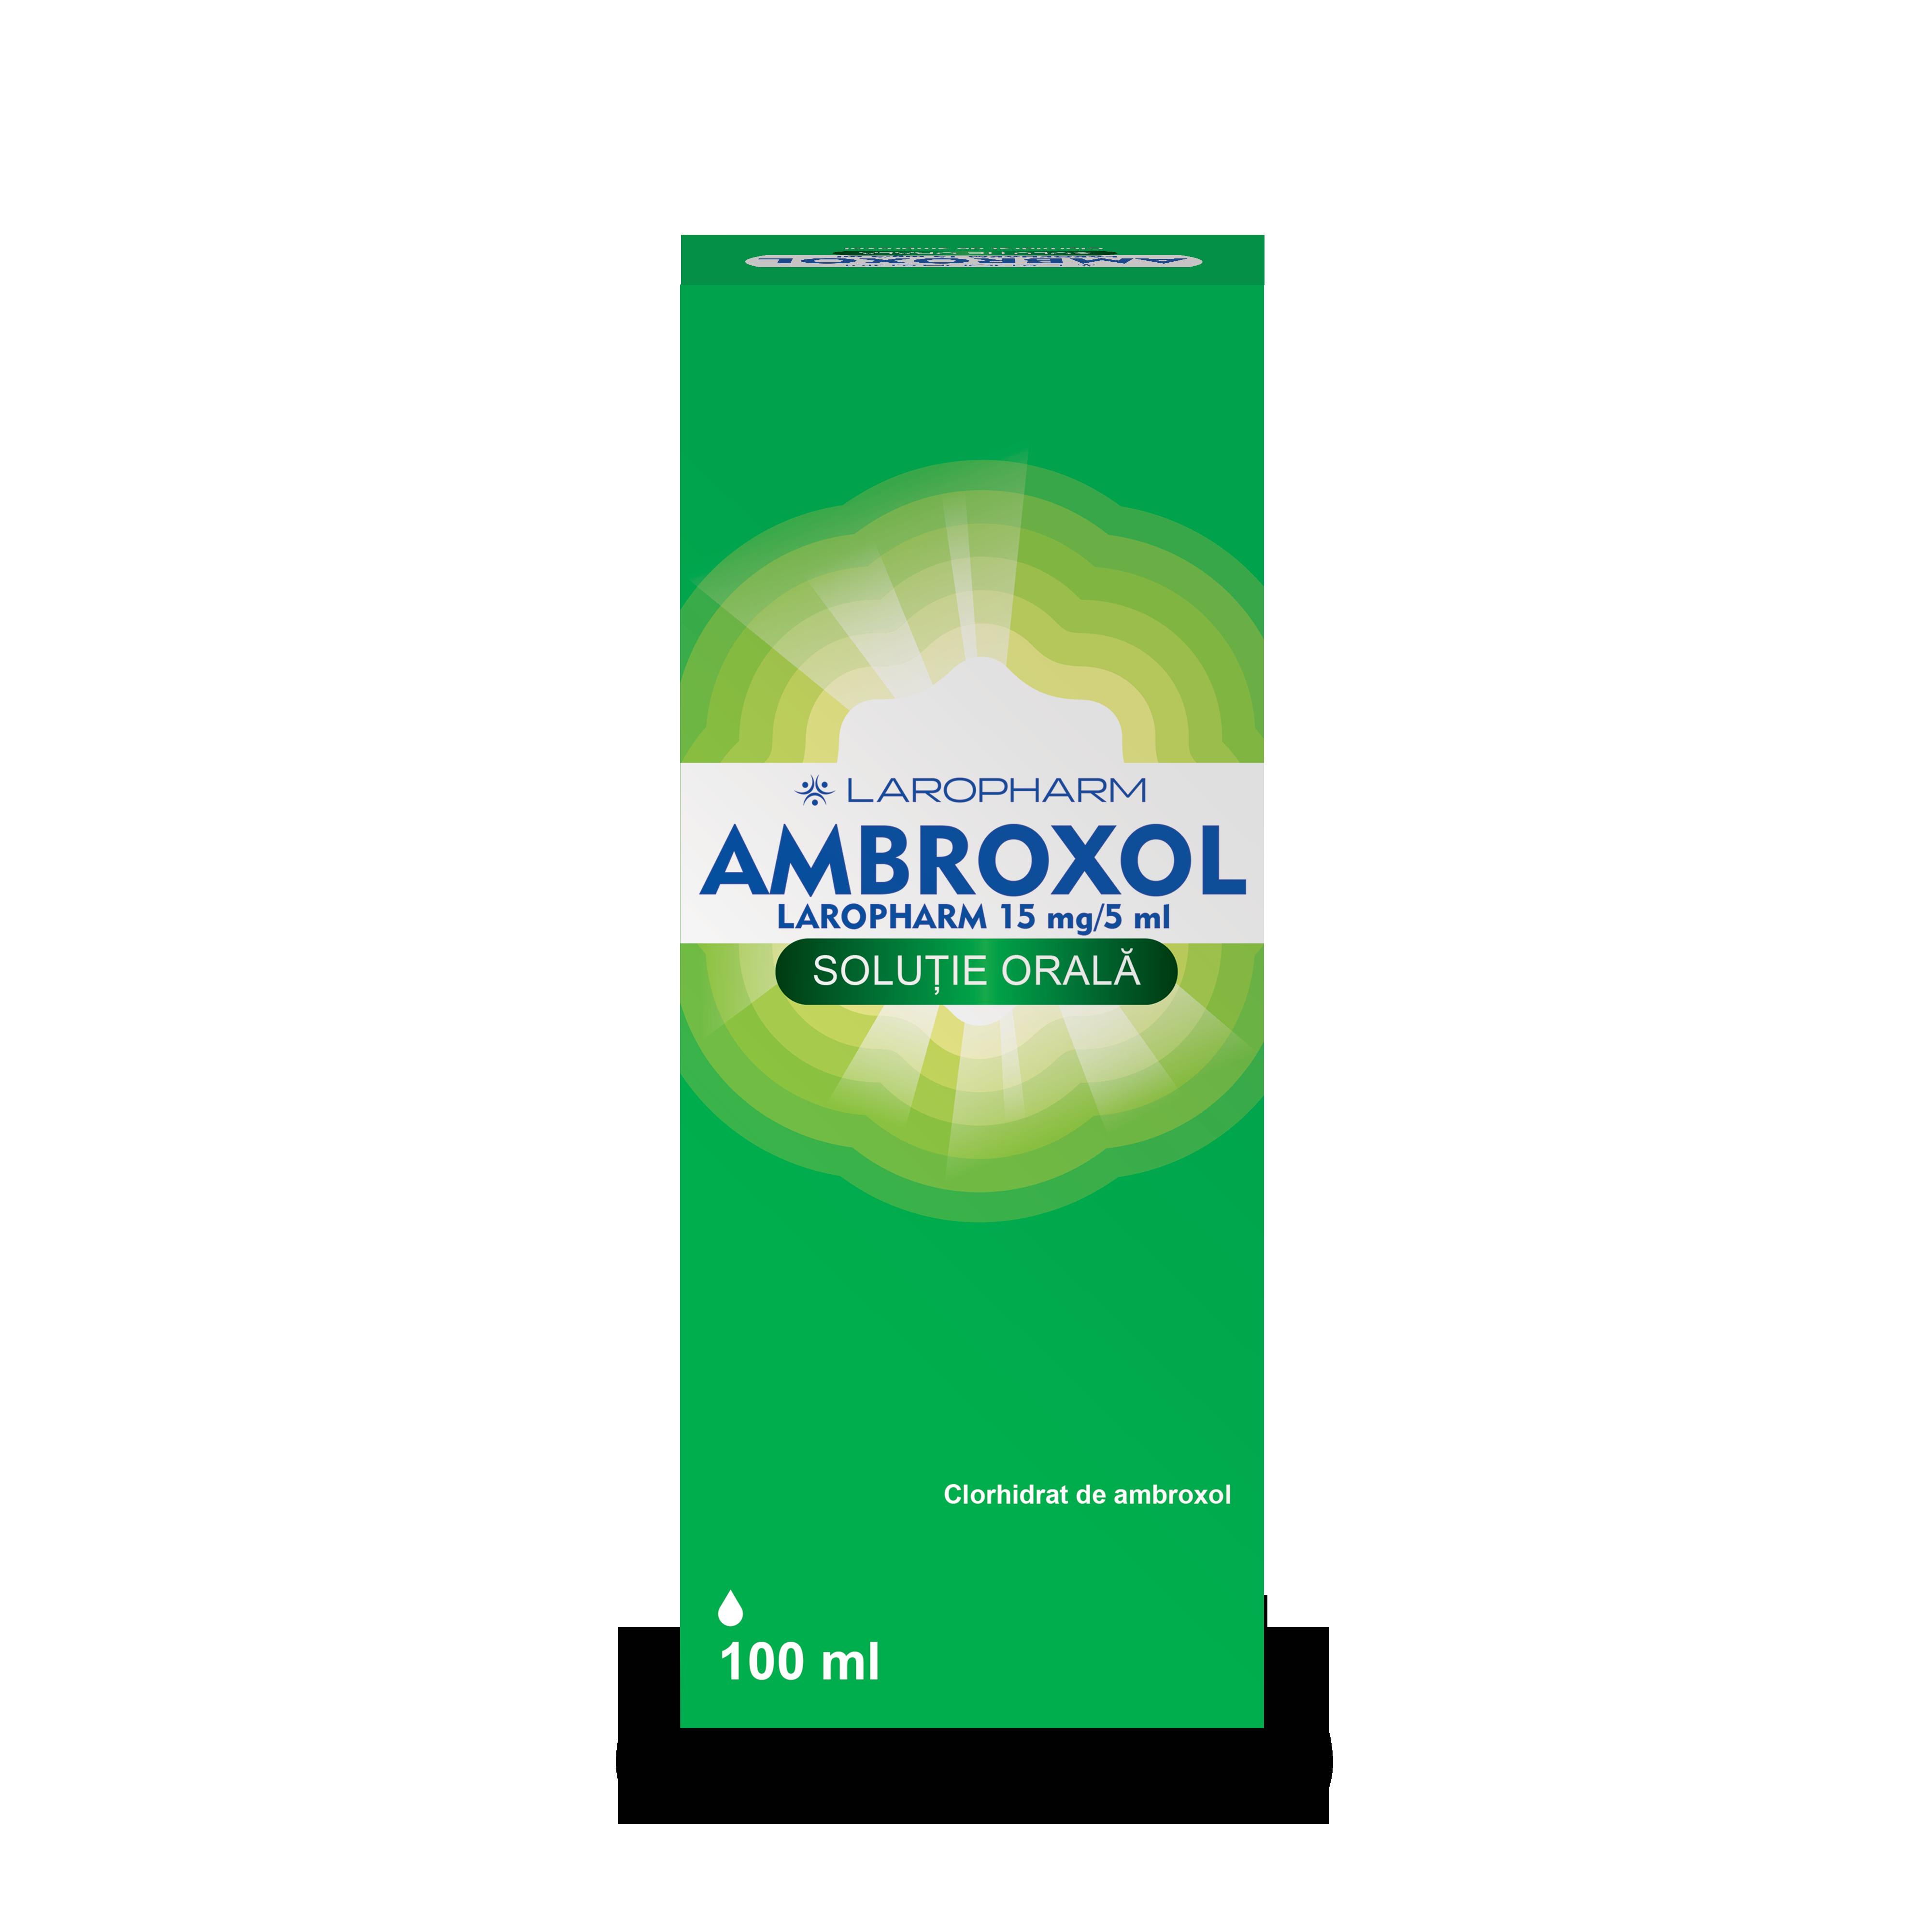 Ambroxol Laropharm